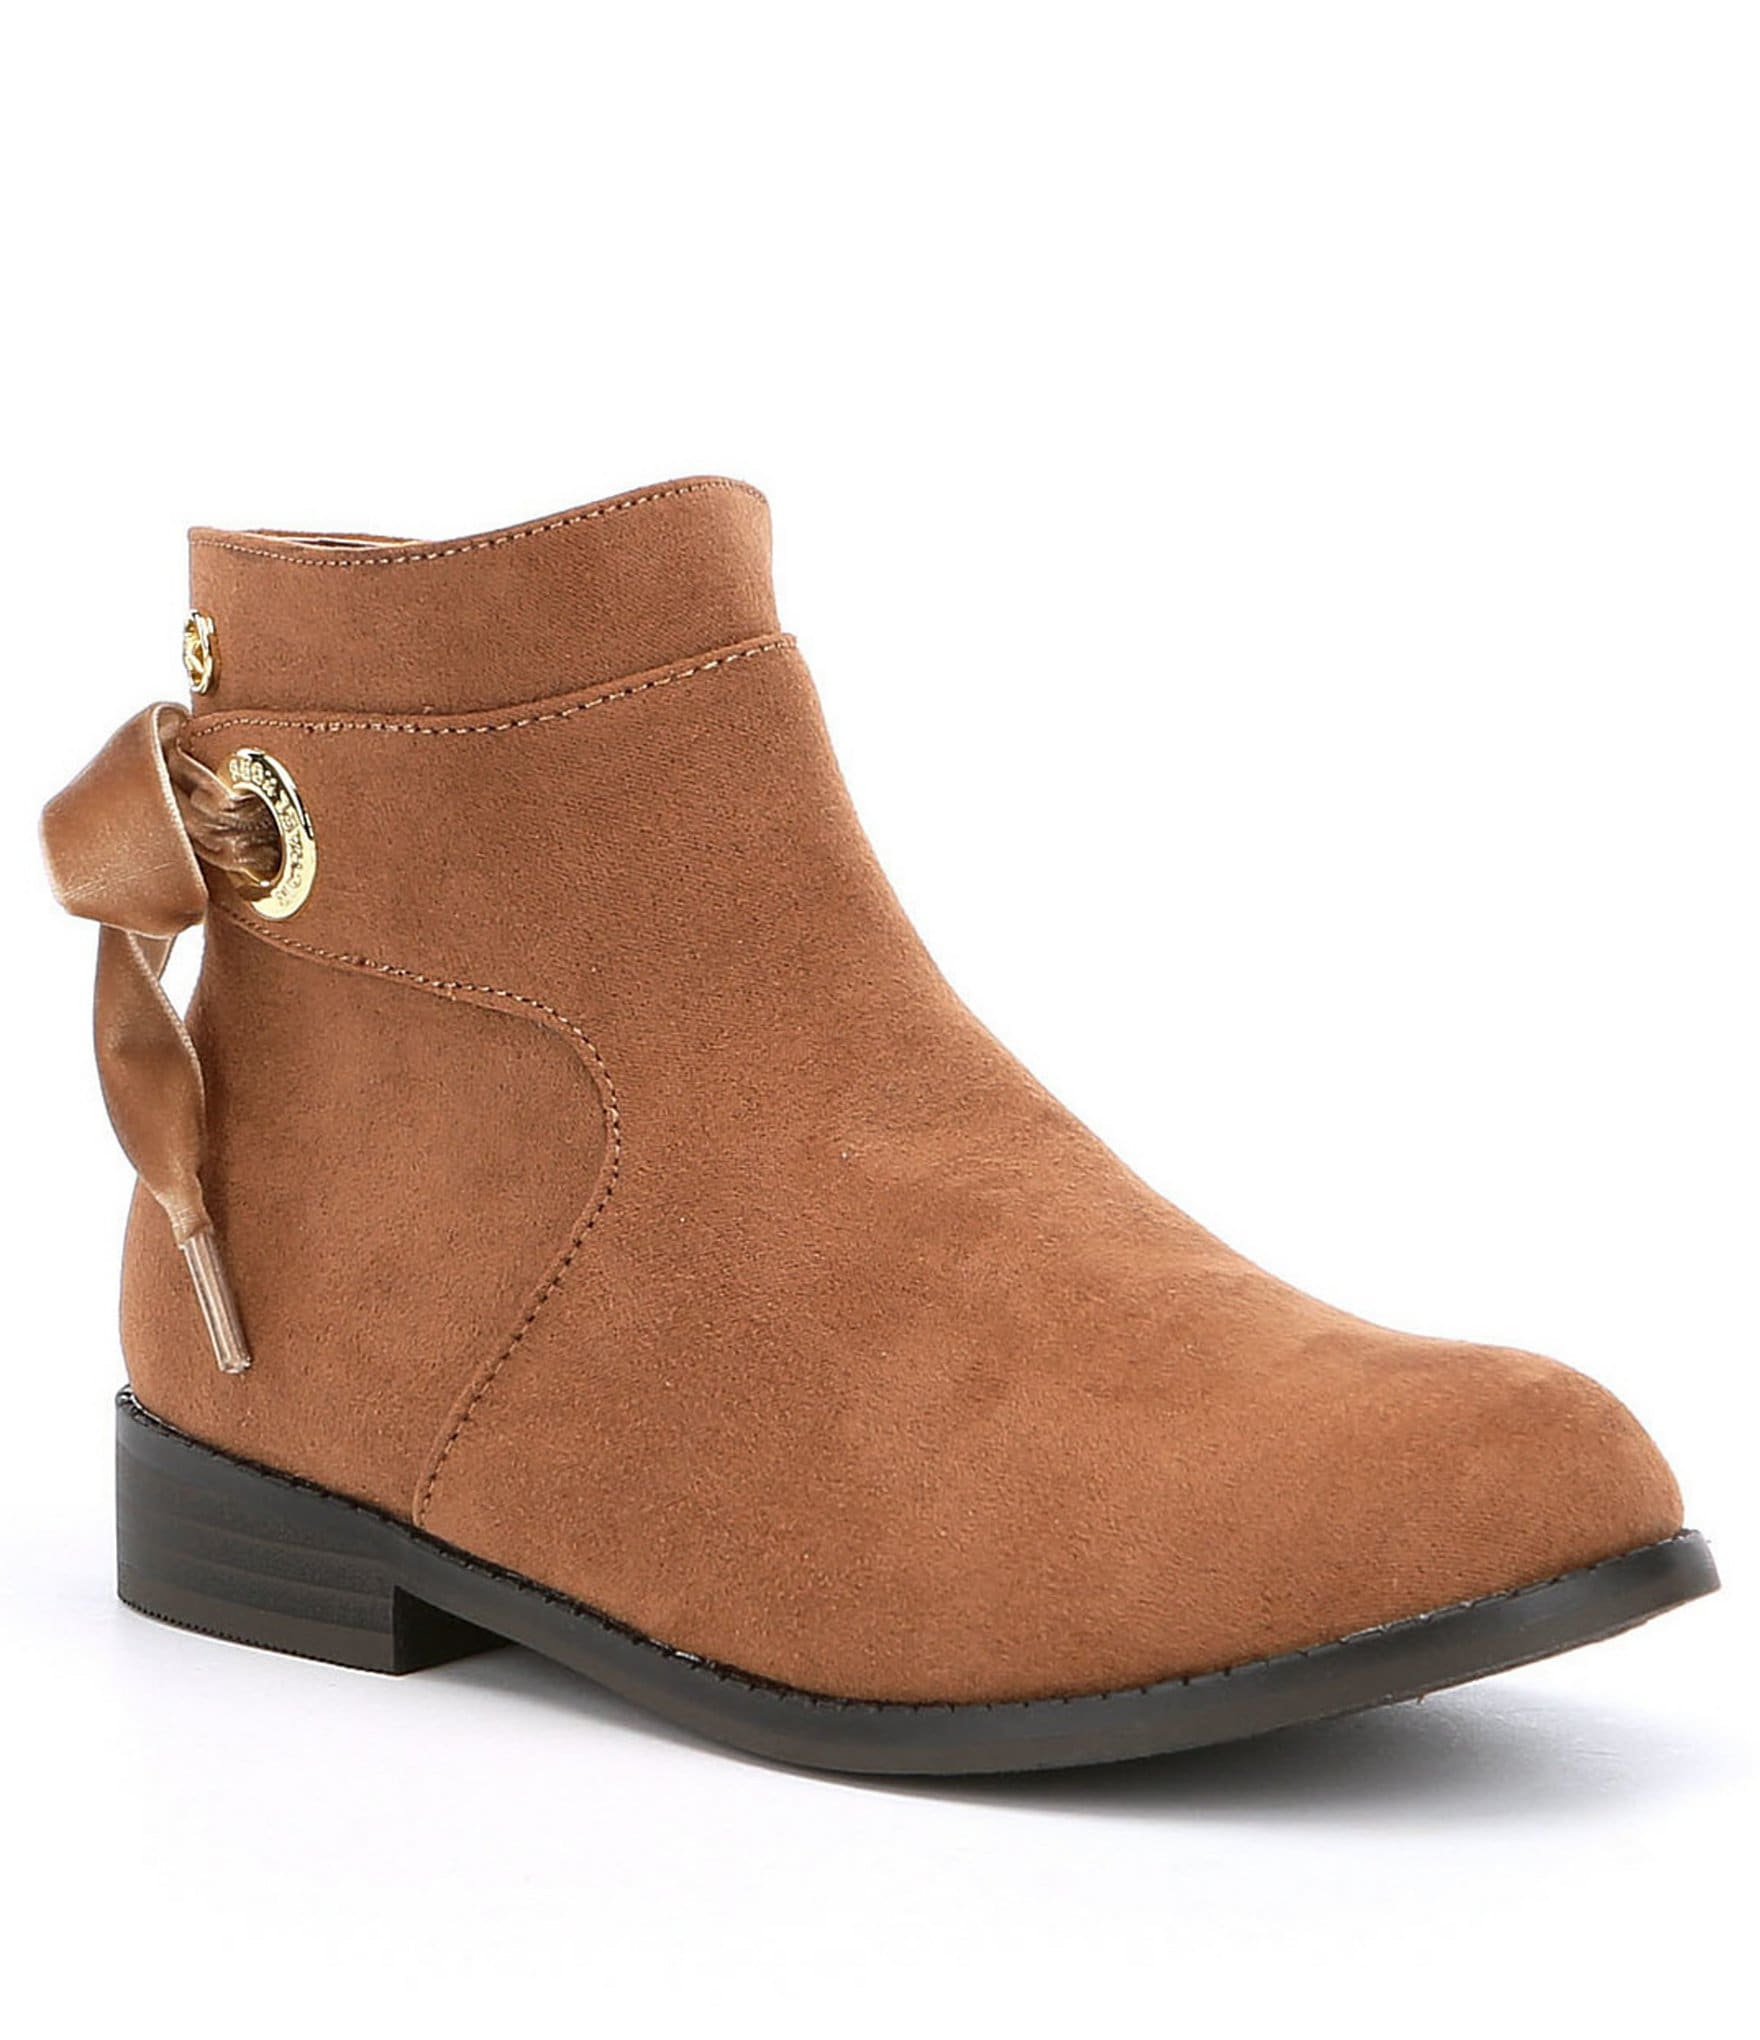 f0b6a5d397a9 Buy orange michael kors shoes   OFF67% Discounted